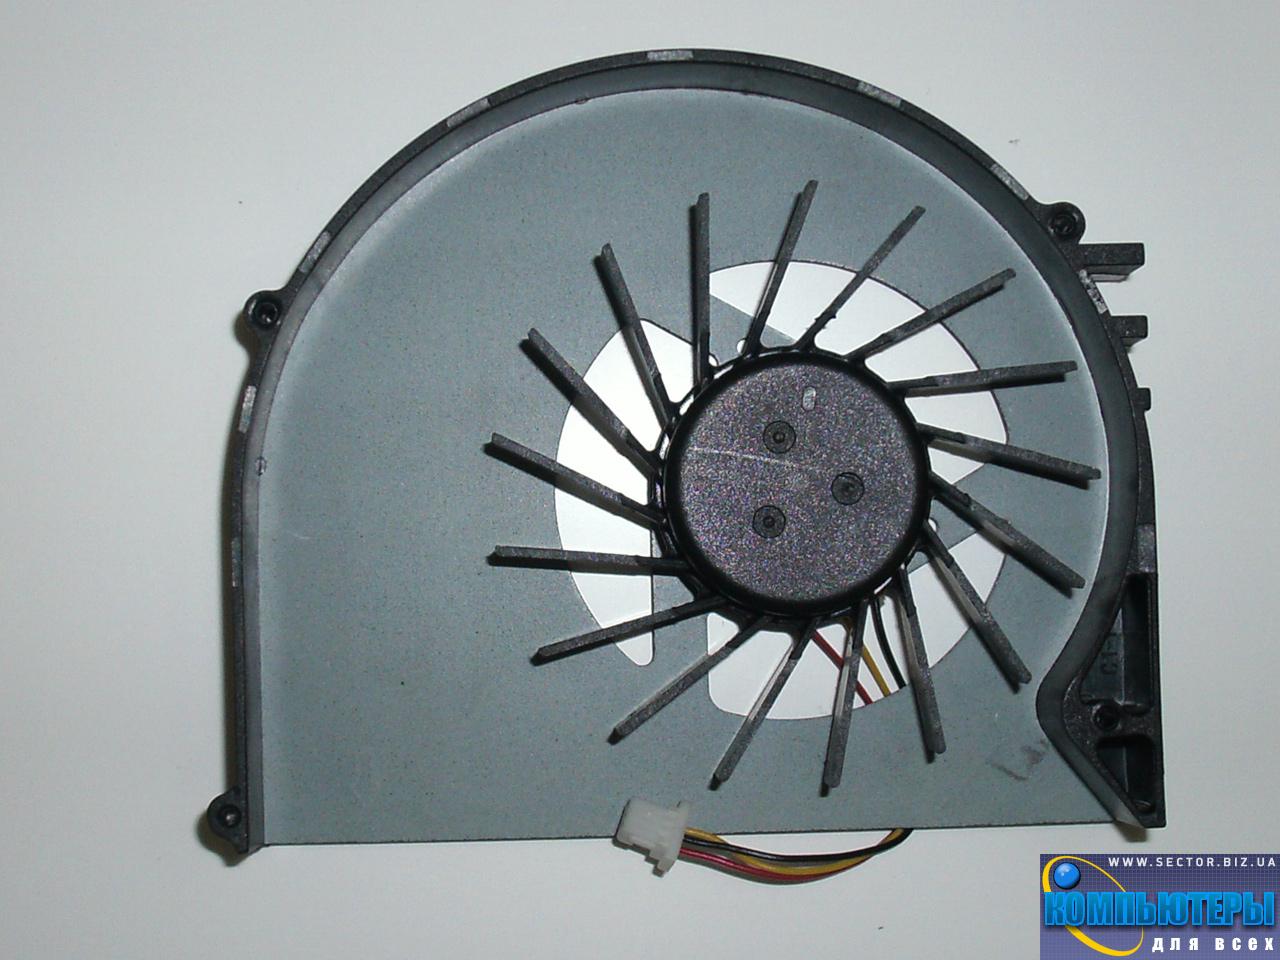 Кулер к ноутбуку Dell Inspiron 15R M5110 N5110 p/n: MF60090V1-C210-G99. Фото № 1.